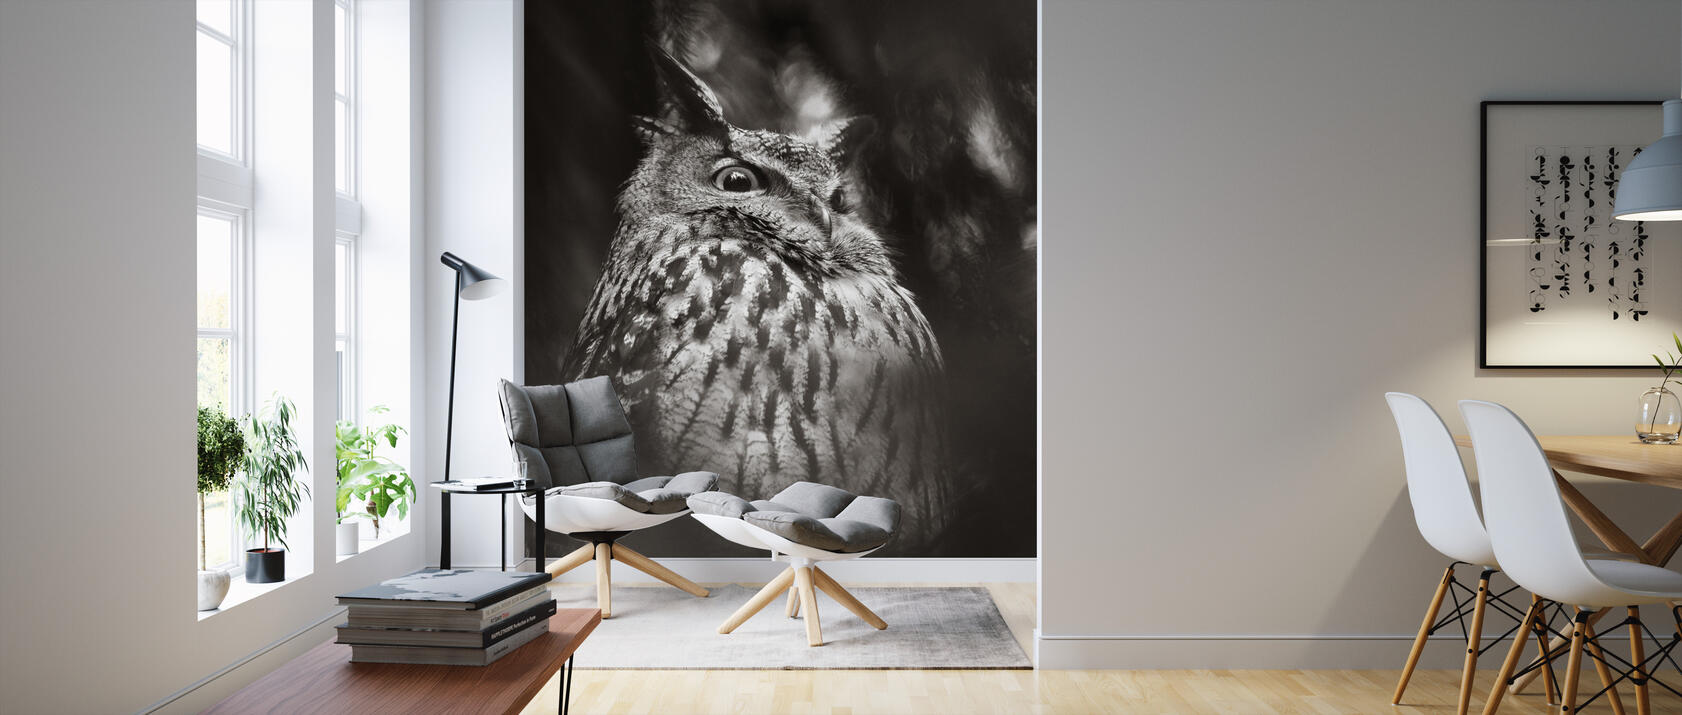 misty owl fototapete nach ma photowall. Black Bedroom Furniture Sets. Home Design Ideas